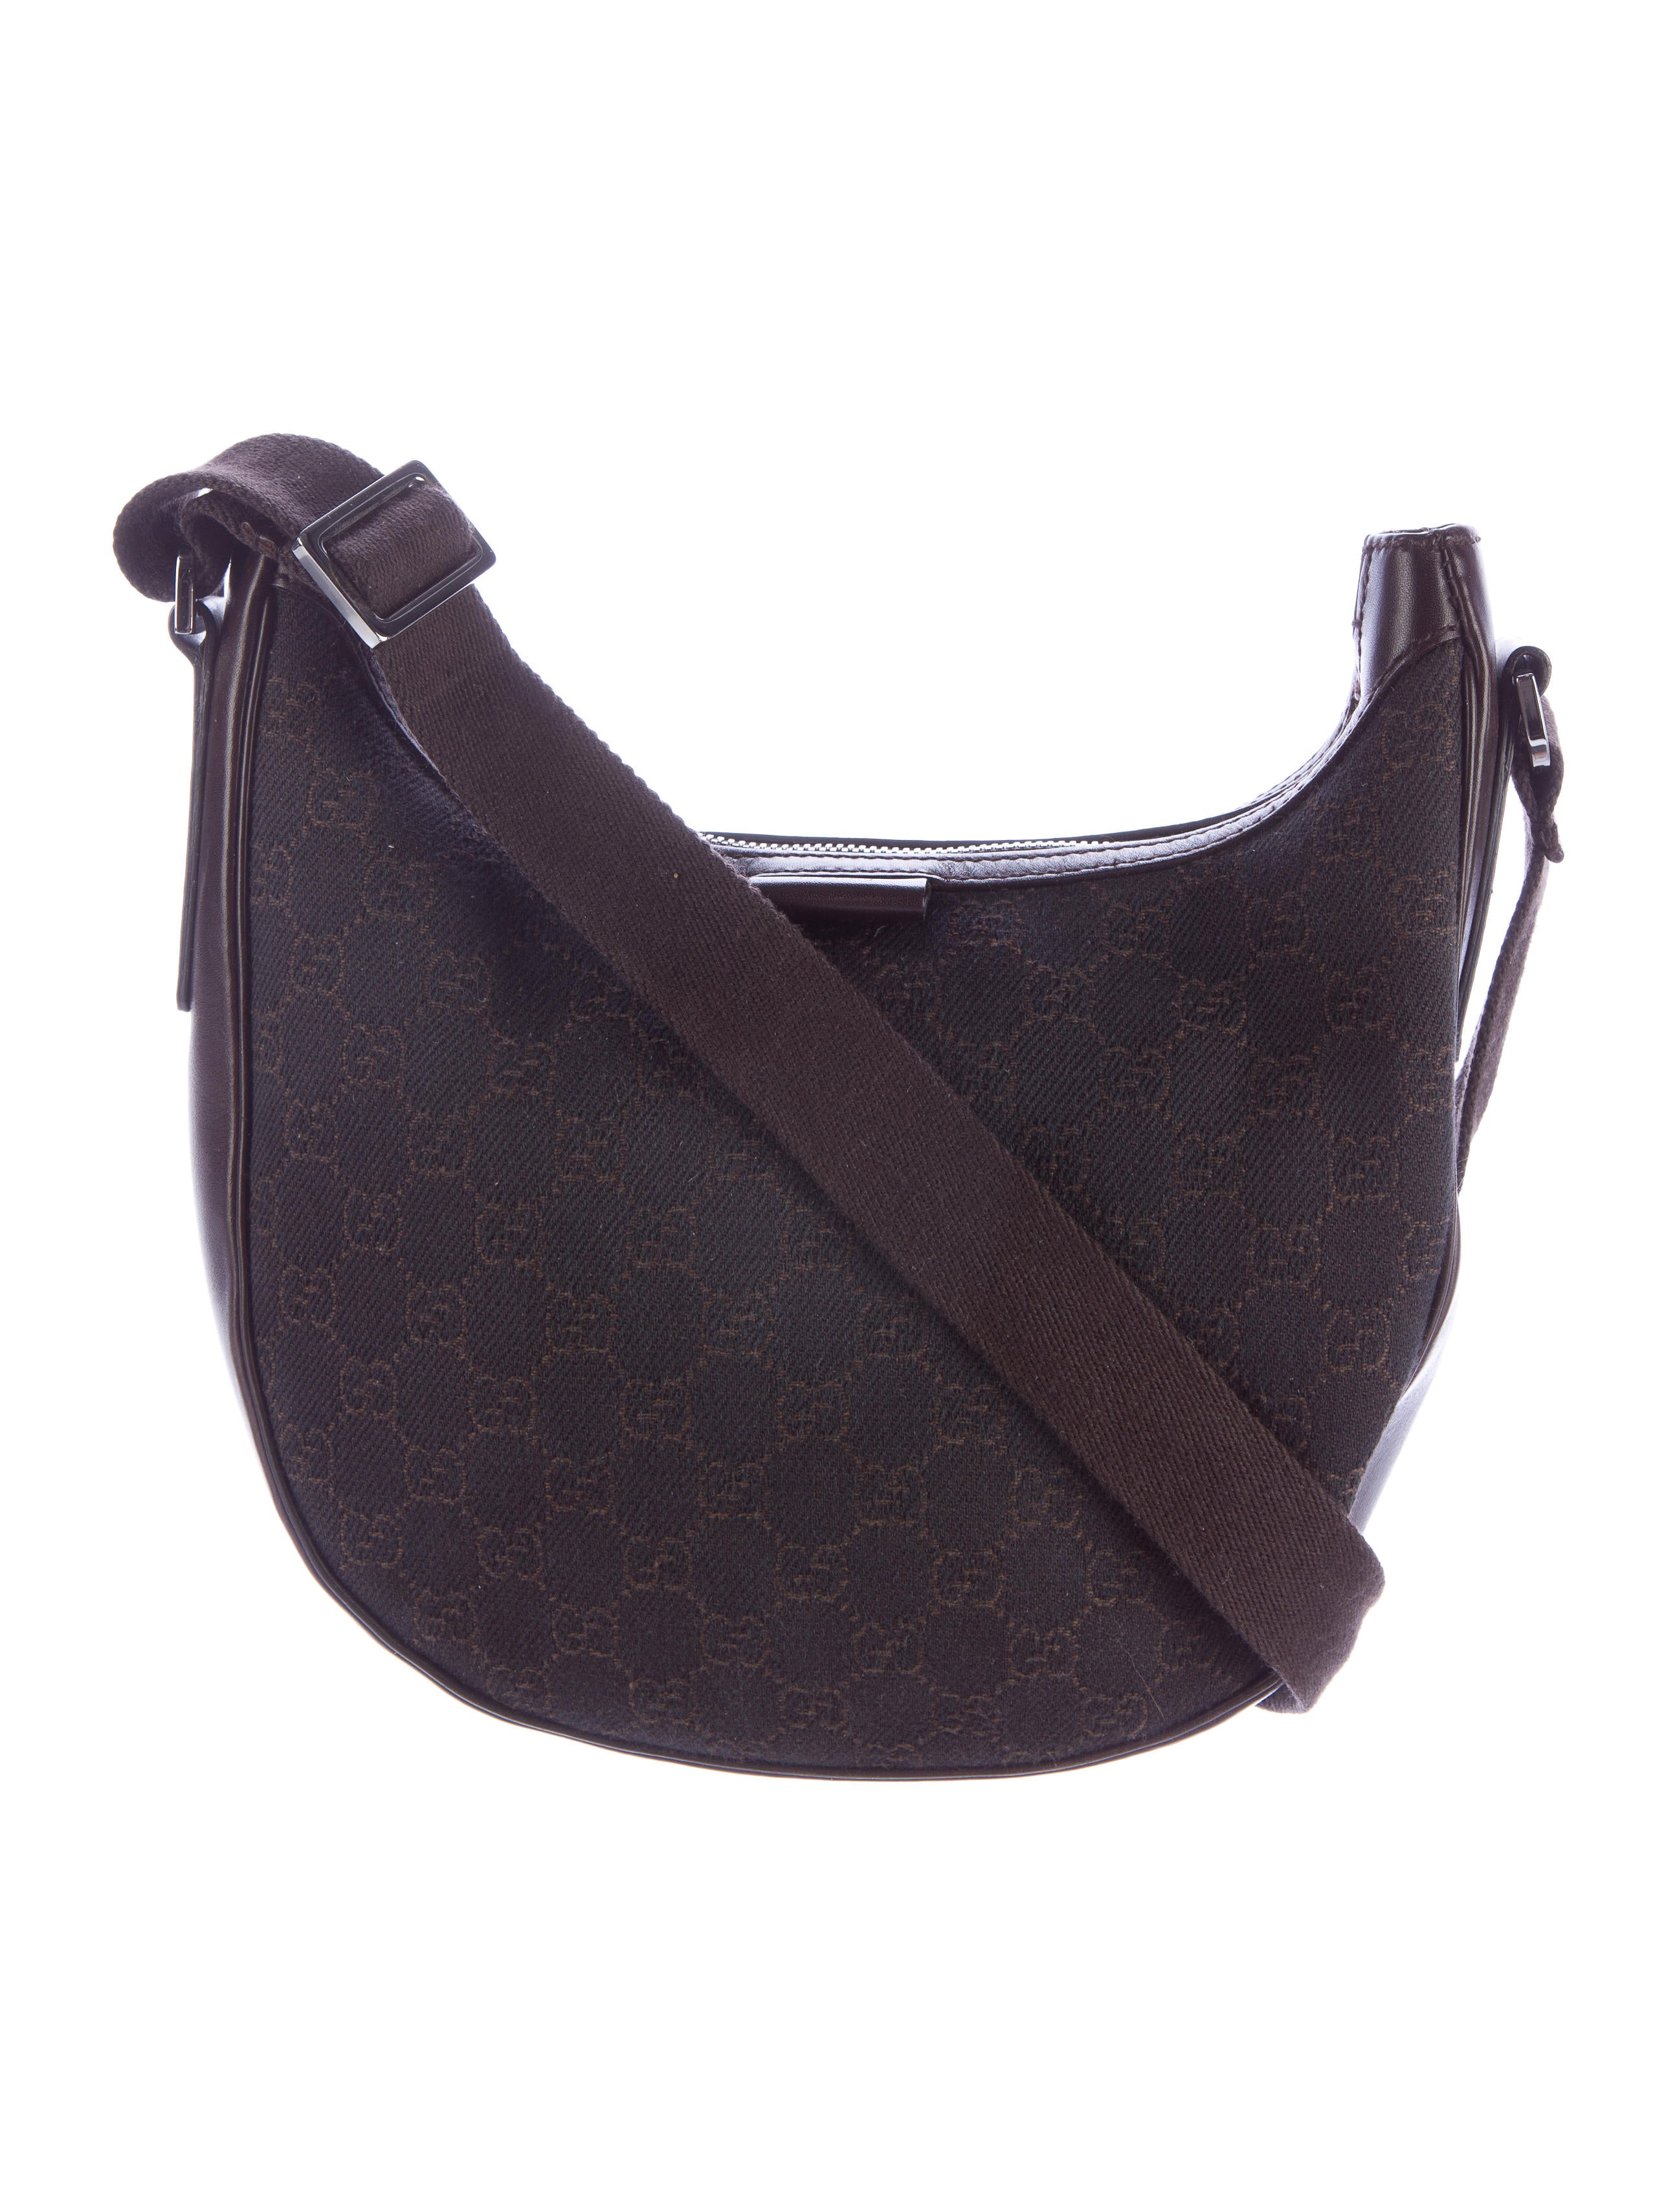 ad3d08dc5bb9 Gucci GG Denim Crossbody Bag - Handbags - GUC125002